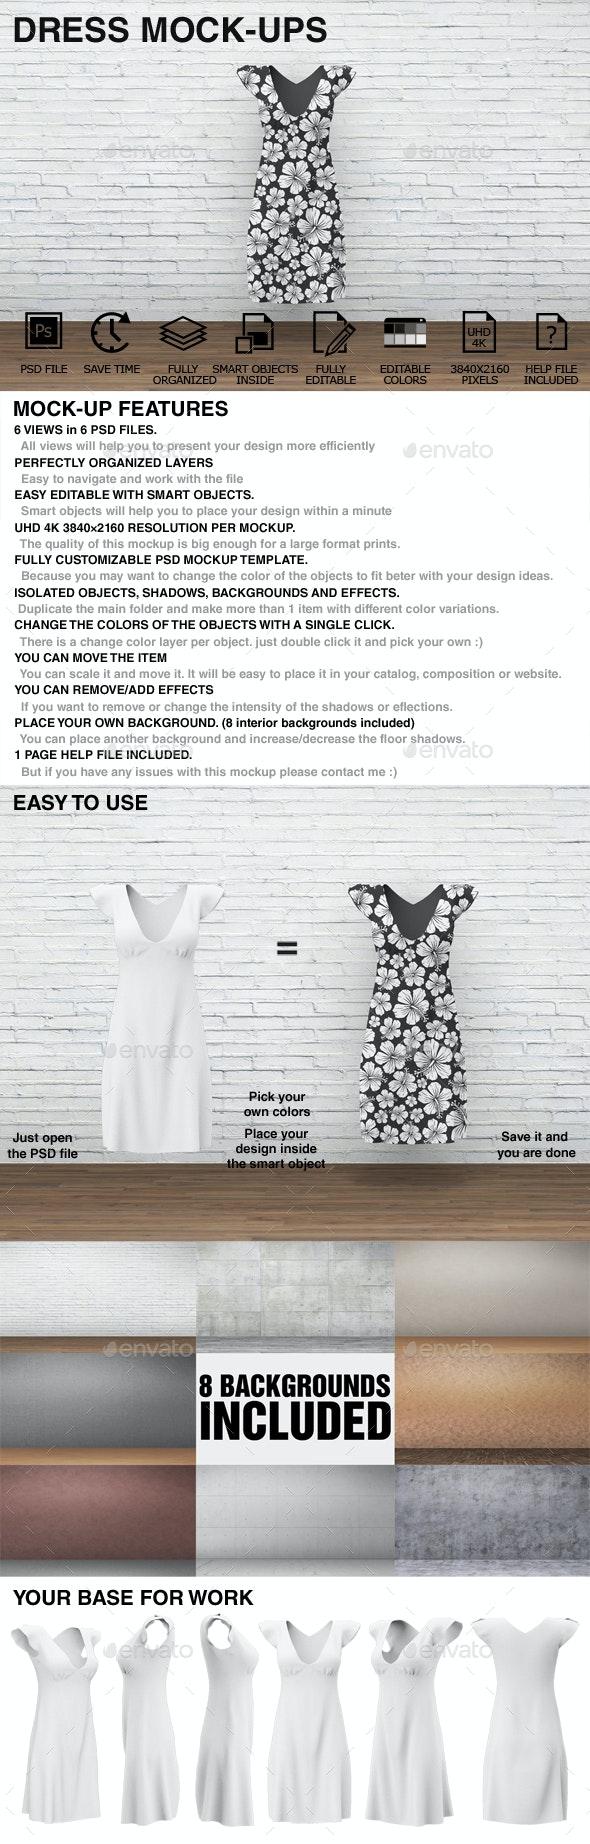 Dress Mockups - Clothing Mockups - Miscellaneous Apparel